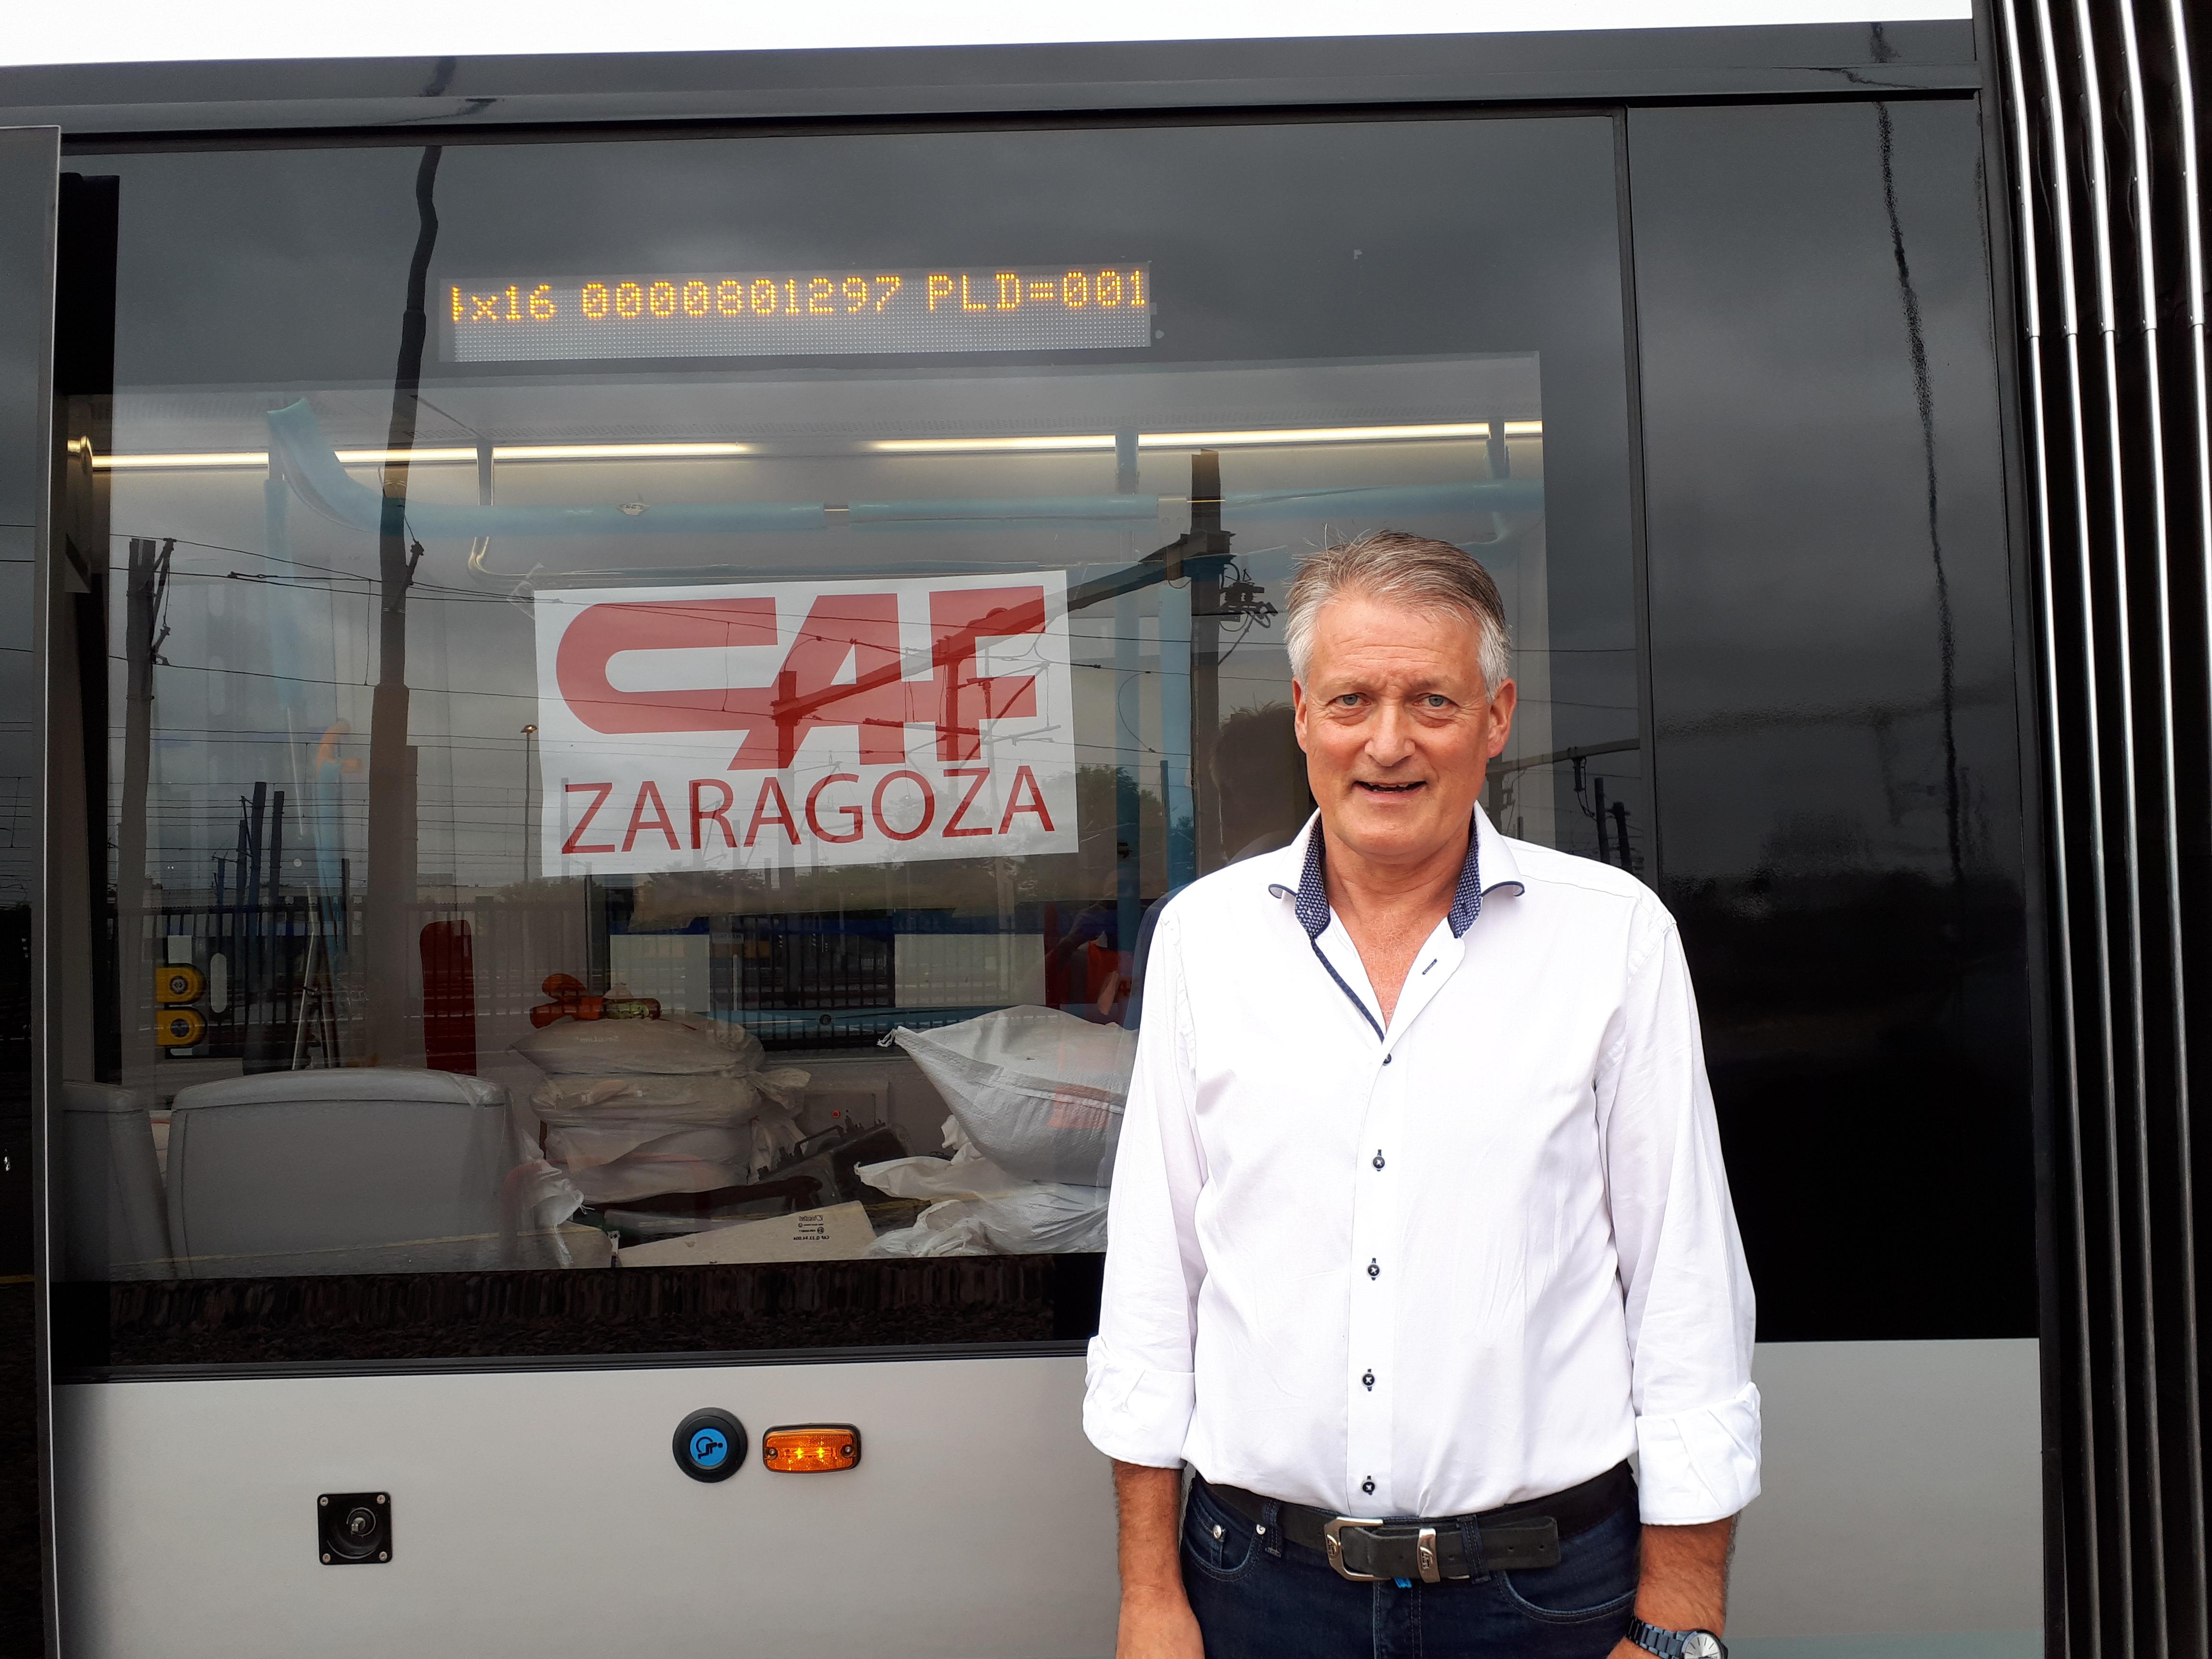 Martin Slippens bij nieuwe 15G tram